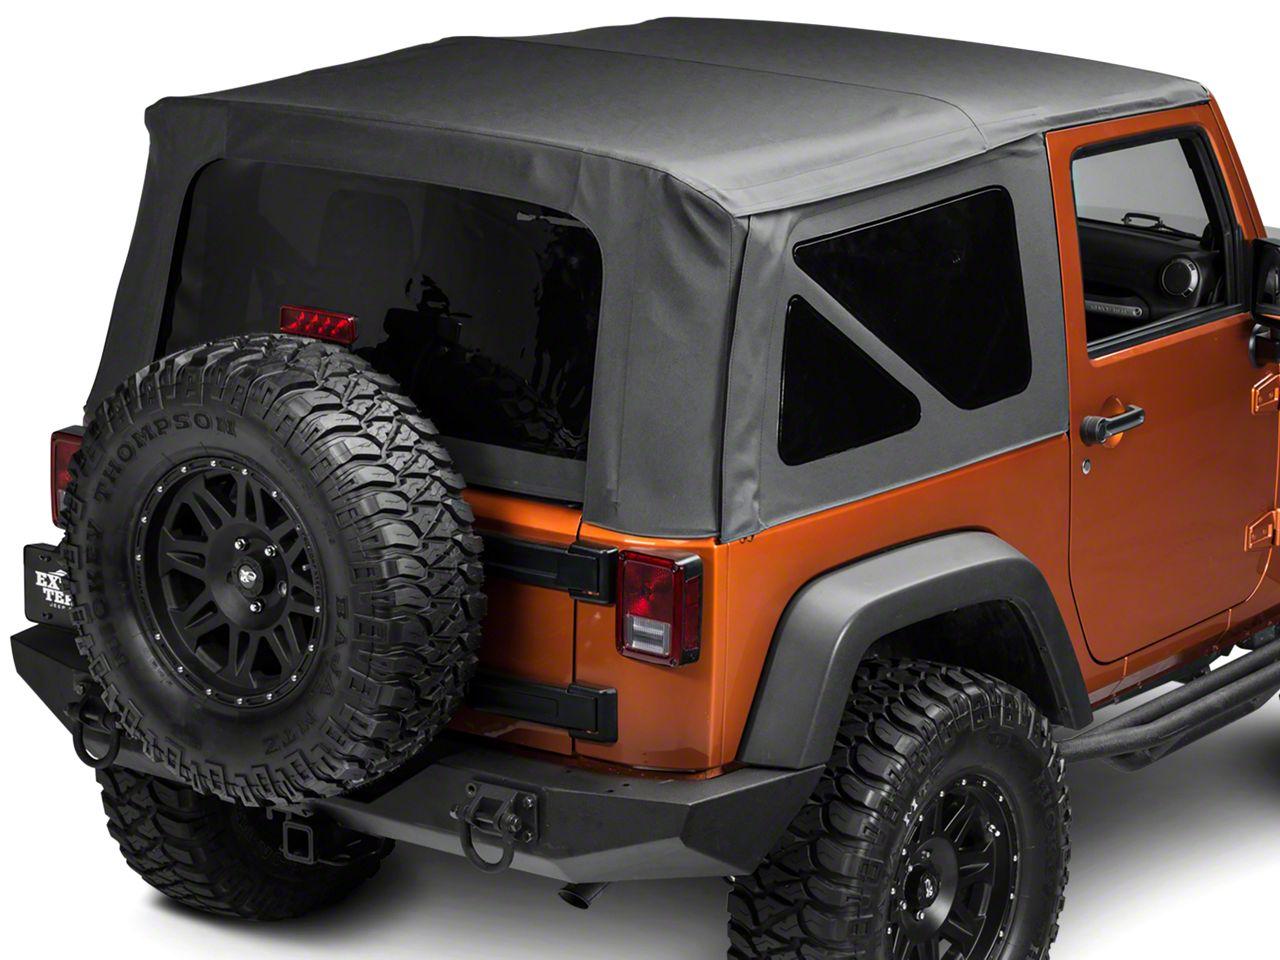 TruShield Replacement Soft Top w/ Tinted Windows - Black Diamond (07-09 Jeep Wrangler JK 2 Door)